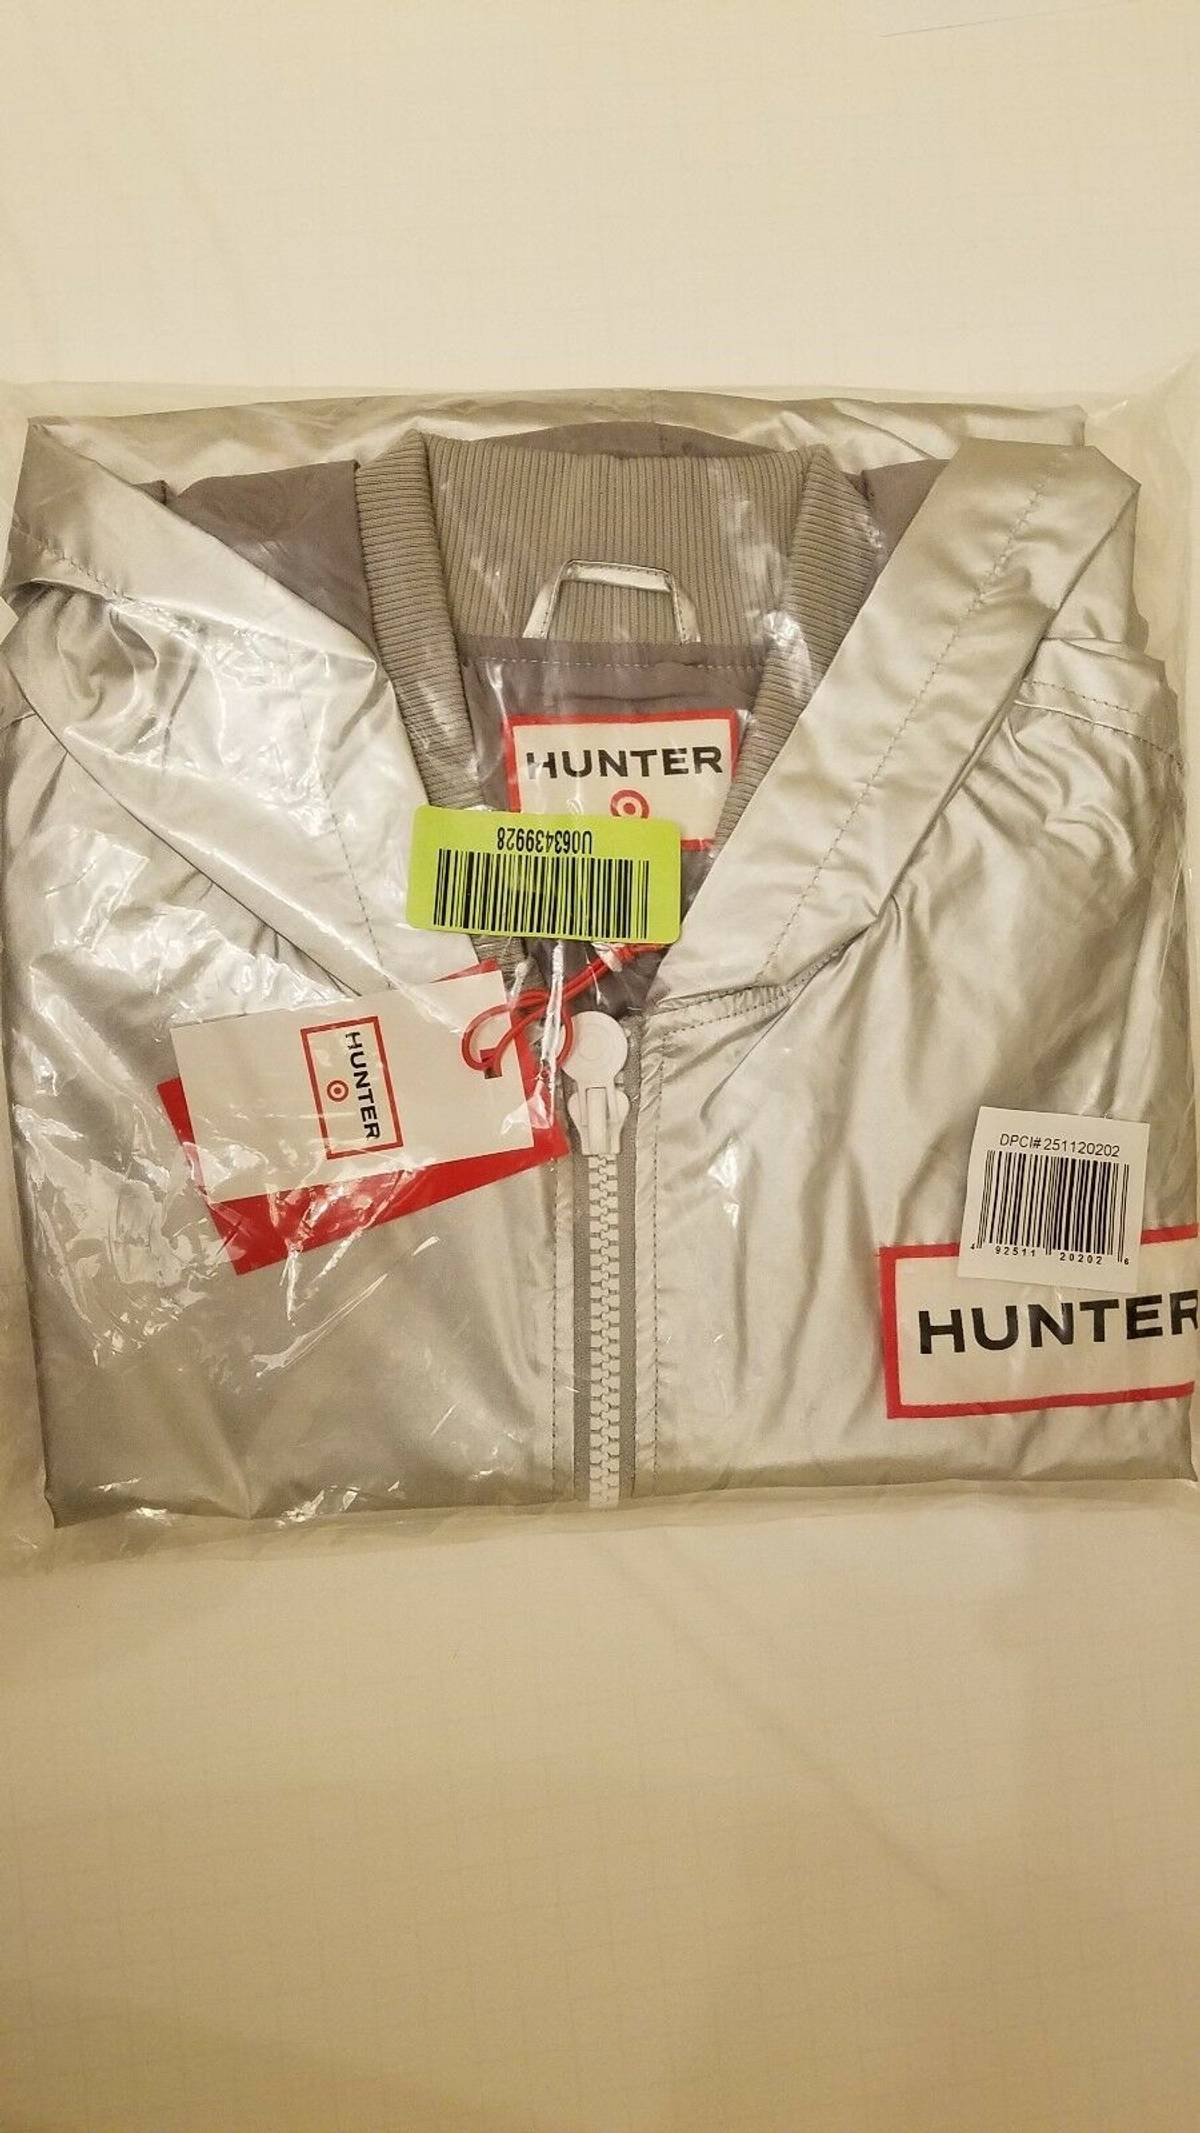 36ece370b Hunter Limited Edition Nwt Hunter X Target Metallic/Silver Light Weight  Jacket Size M $44